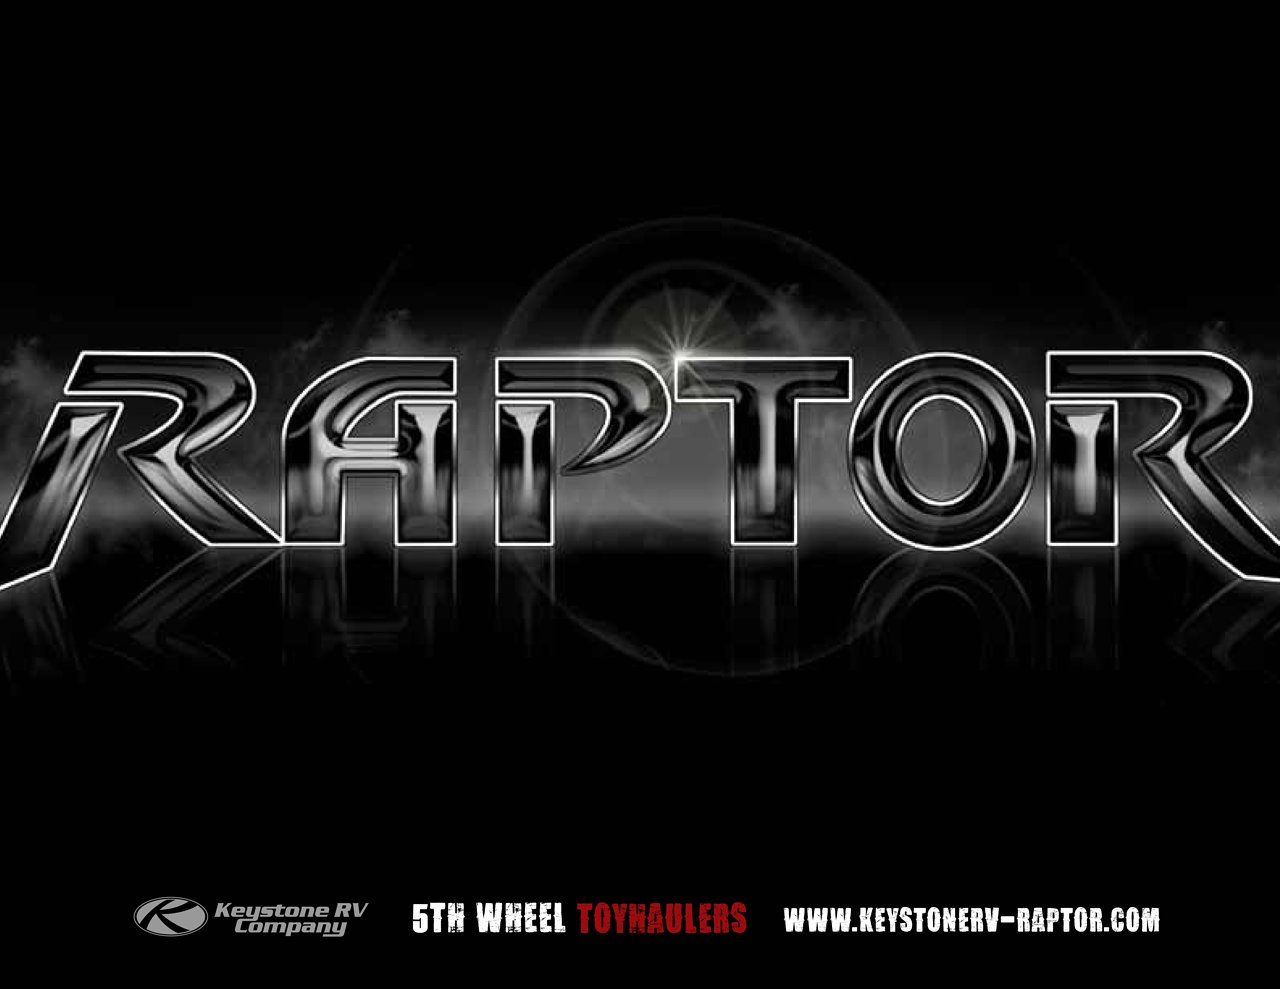 2011 Keystone RV Raptor Brochure | Download RV brochures